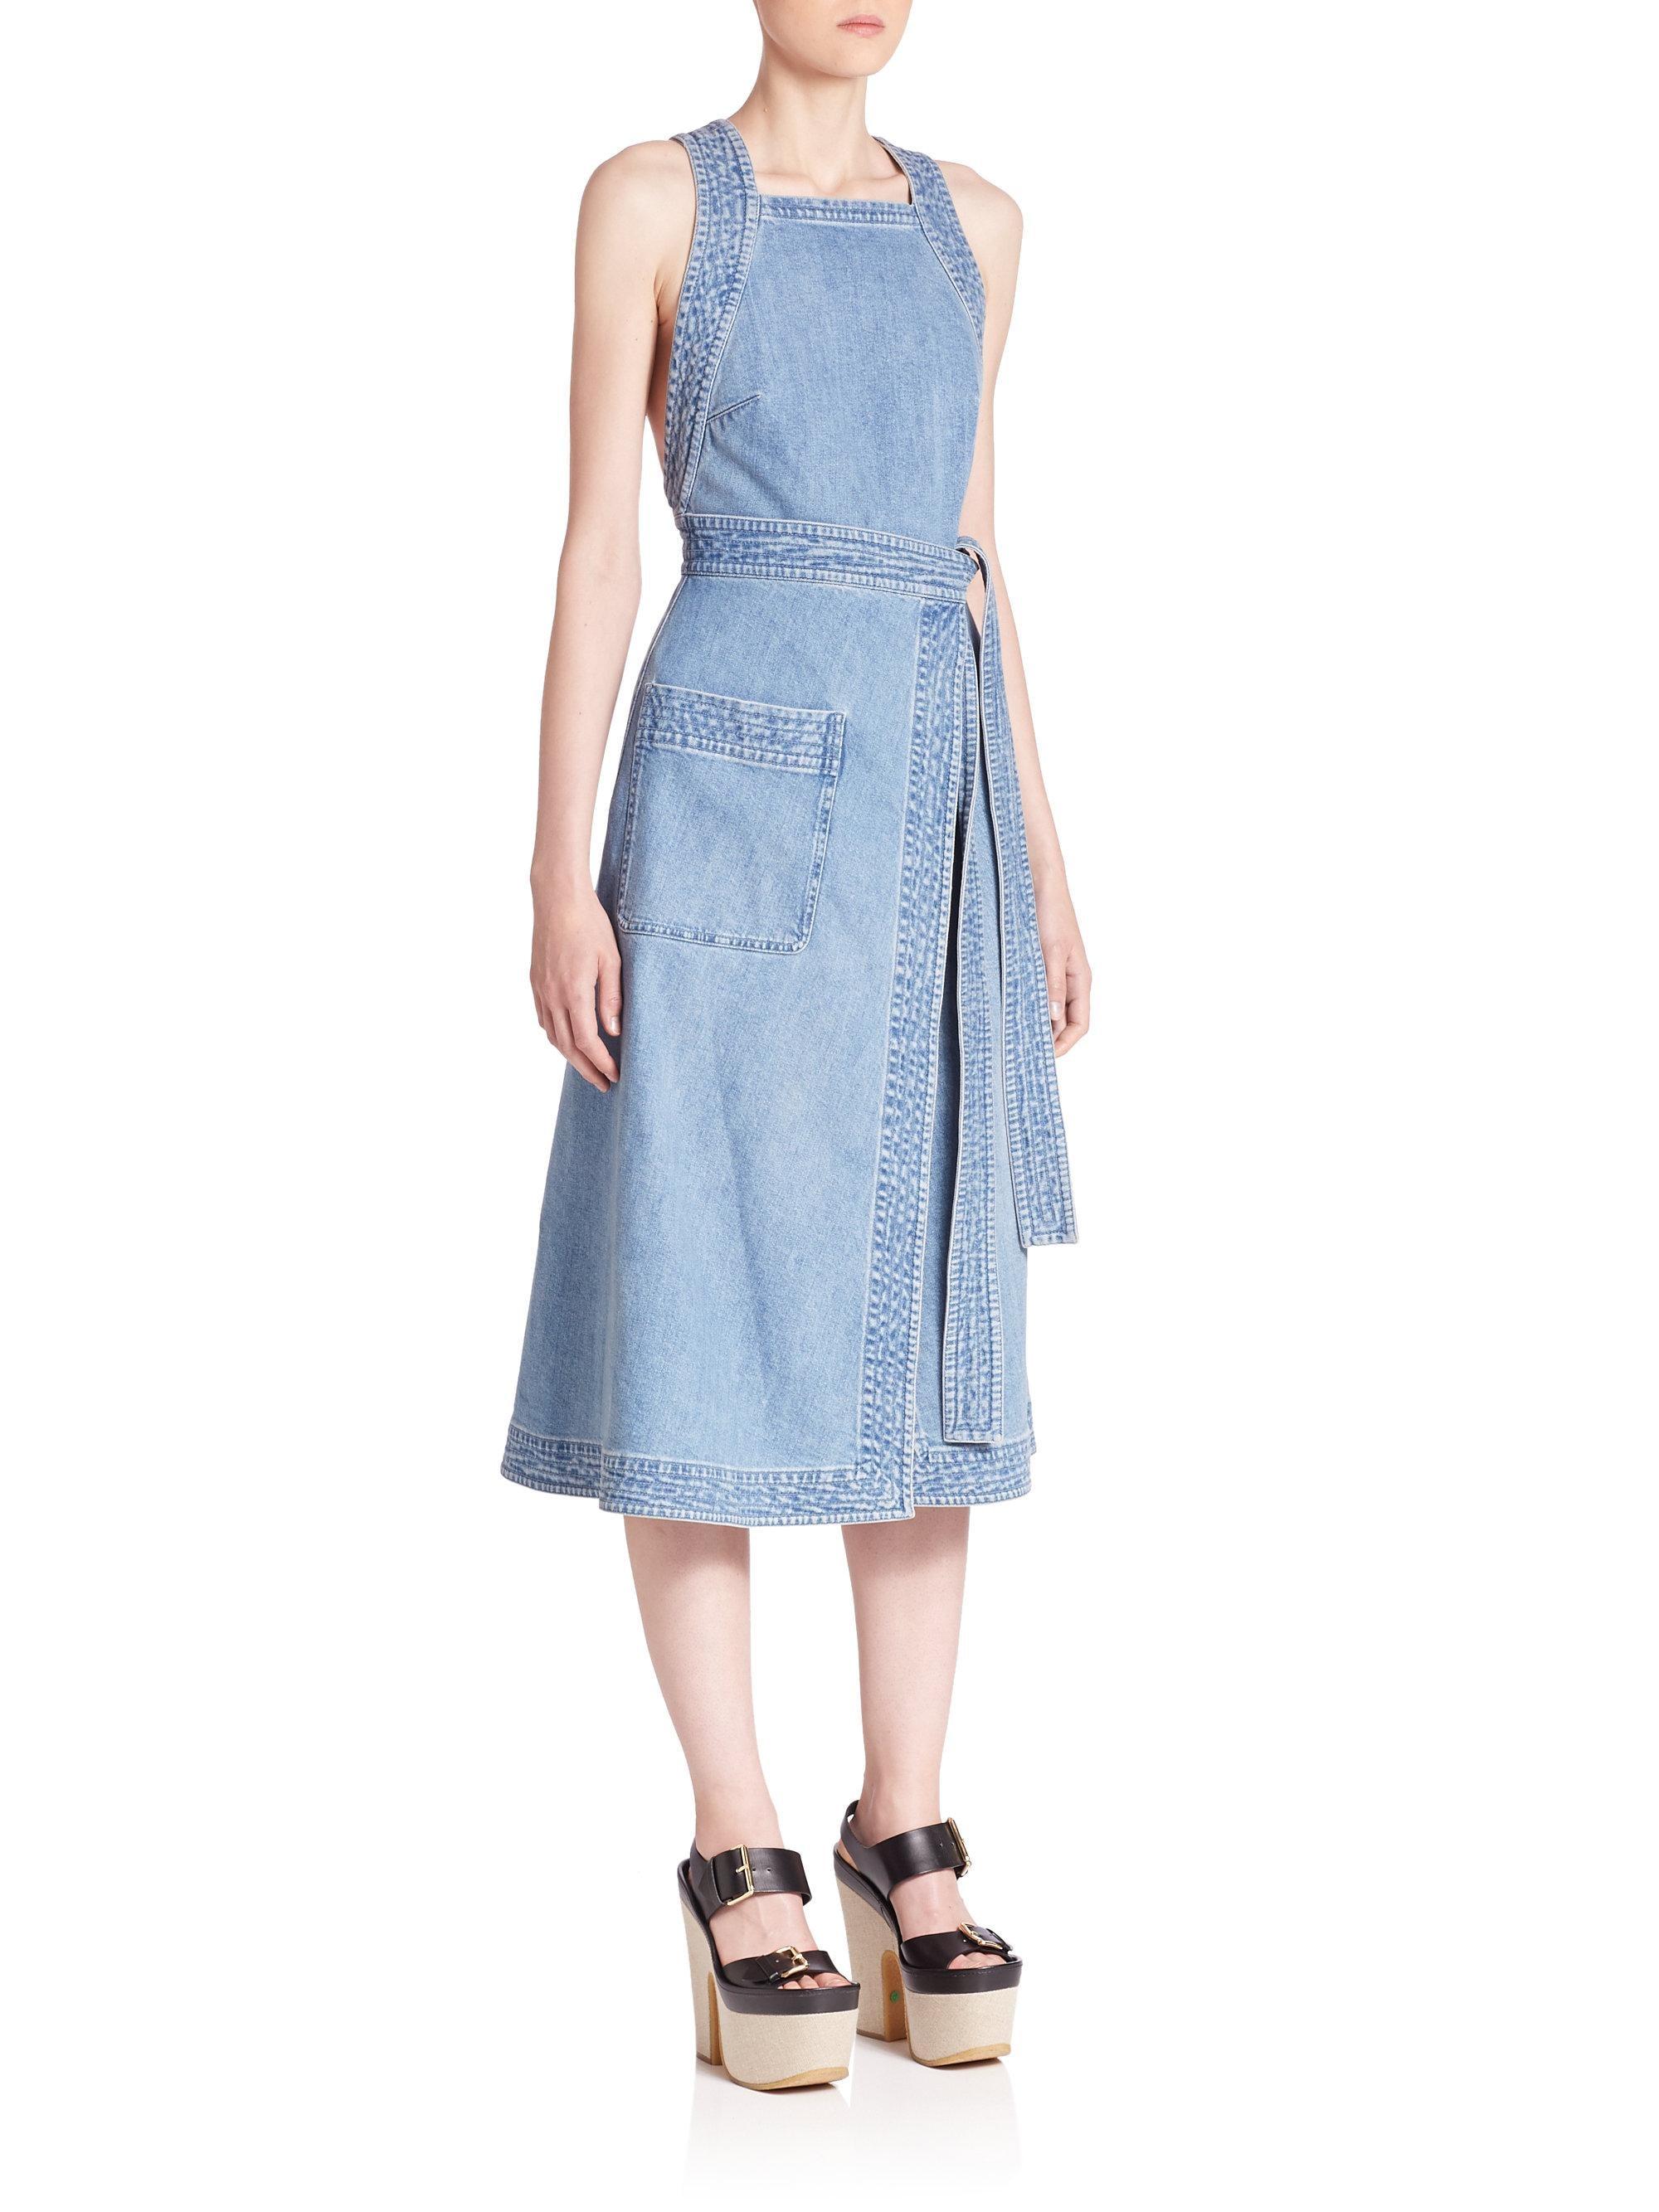 Kendall Jenner Stella McCartney Denim Dress   POPSUGAR Fashion